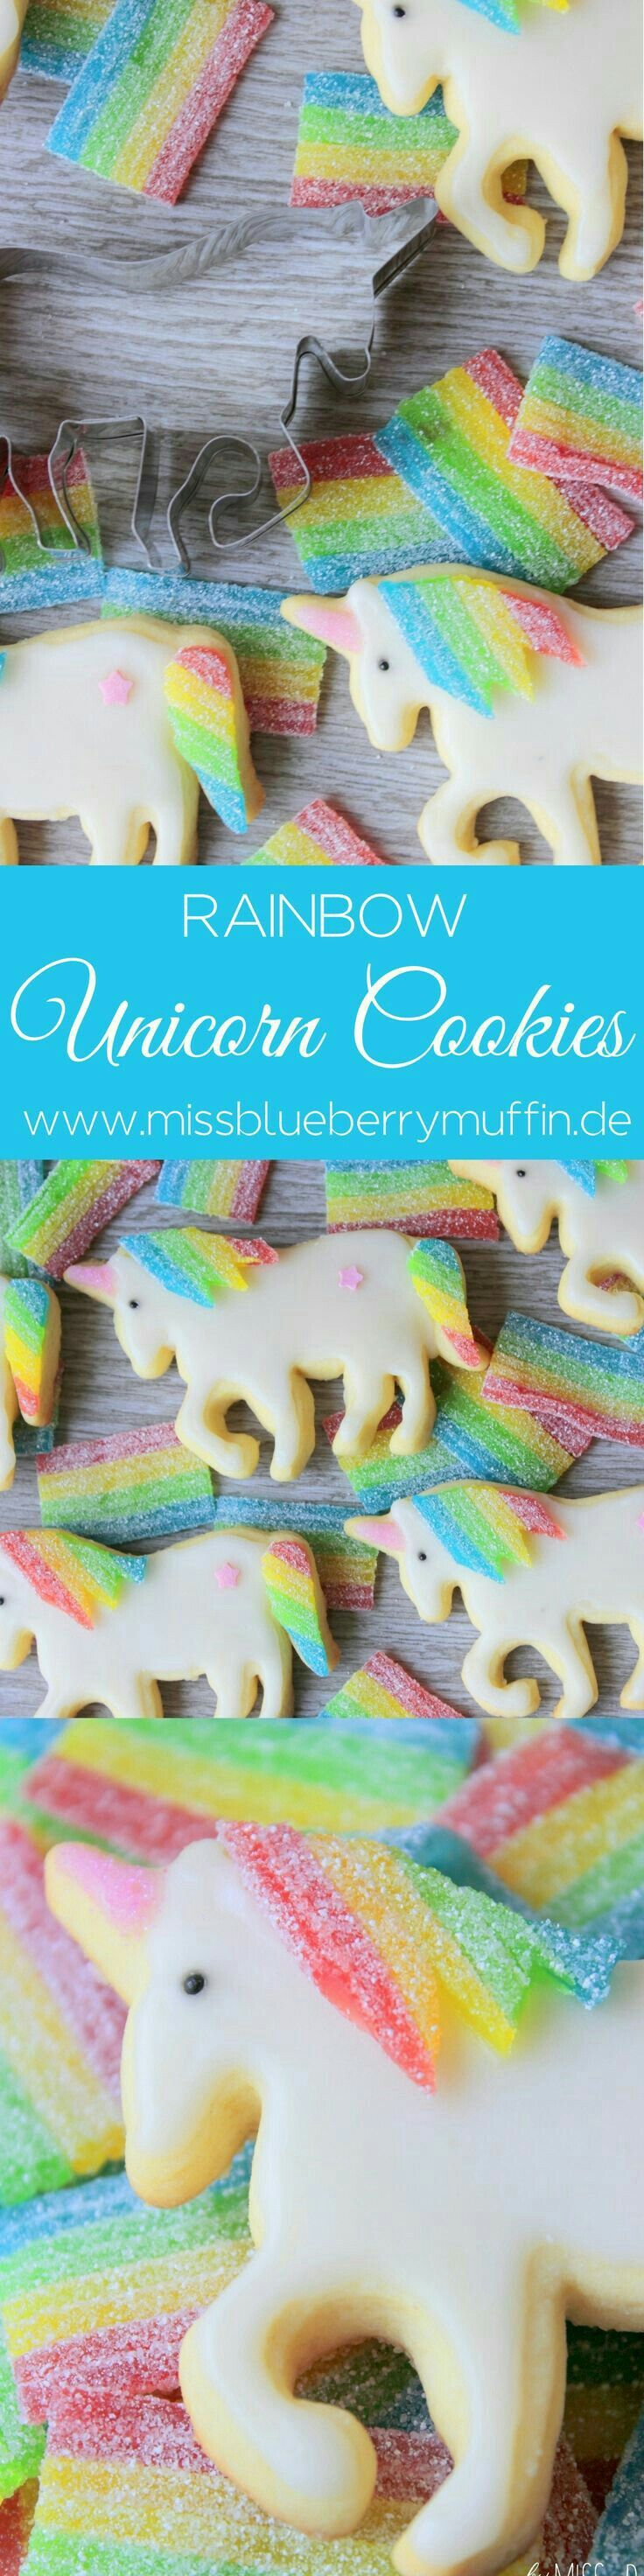 Rainbow unicorn cookies | @cecily_ilana